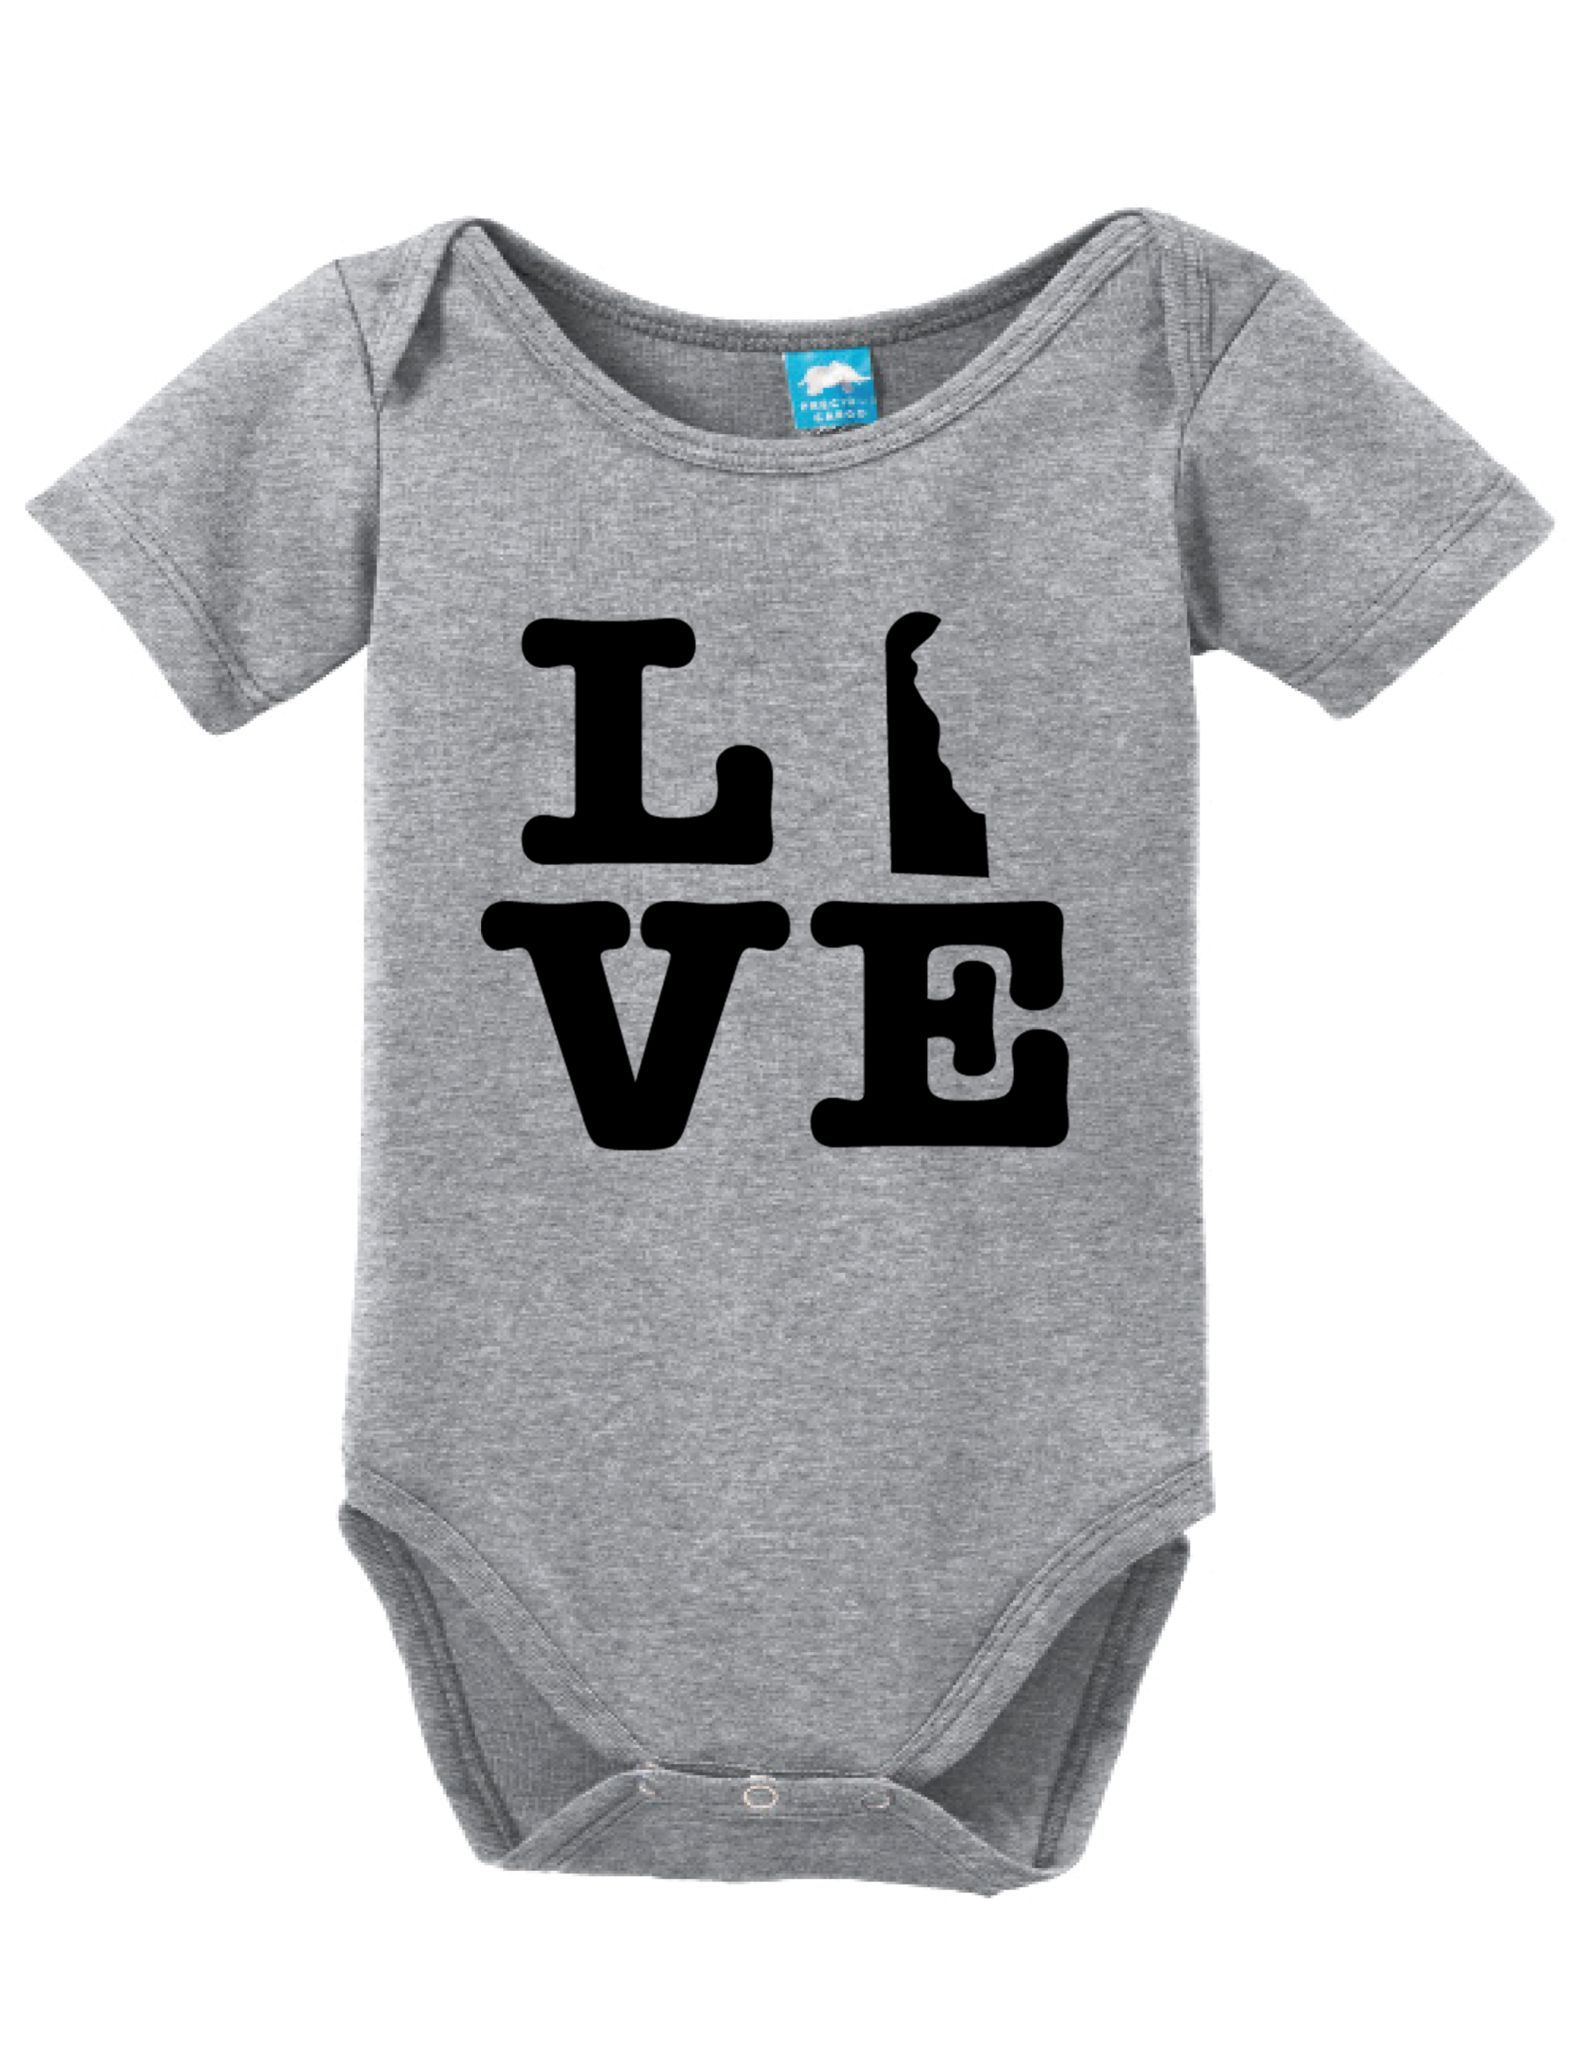 5b3b67c85 Delaware Love Onesie Funny Bodysuit Baby Romper